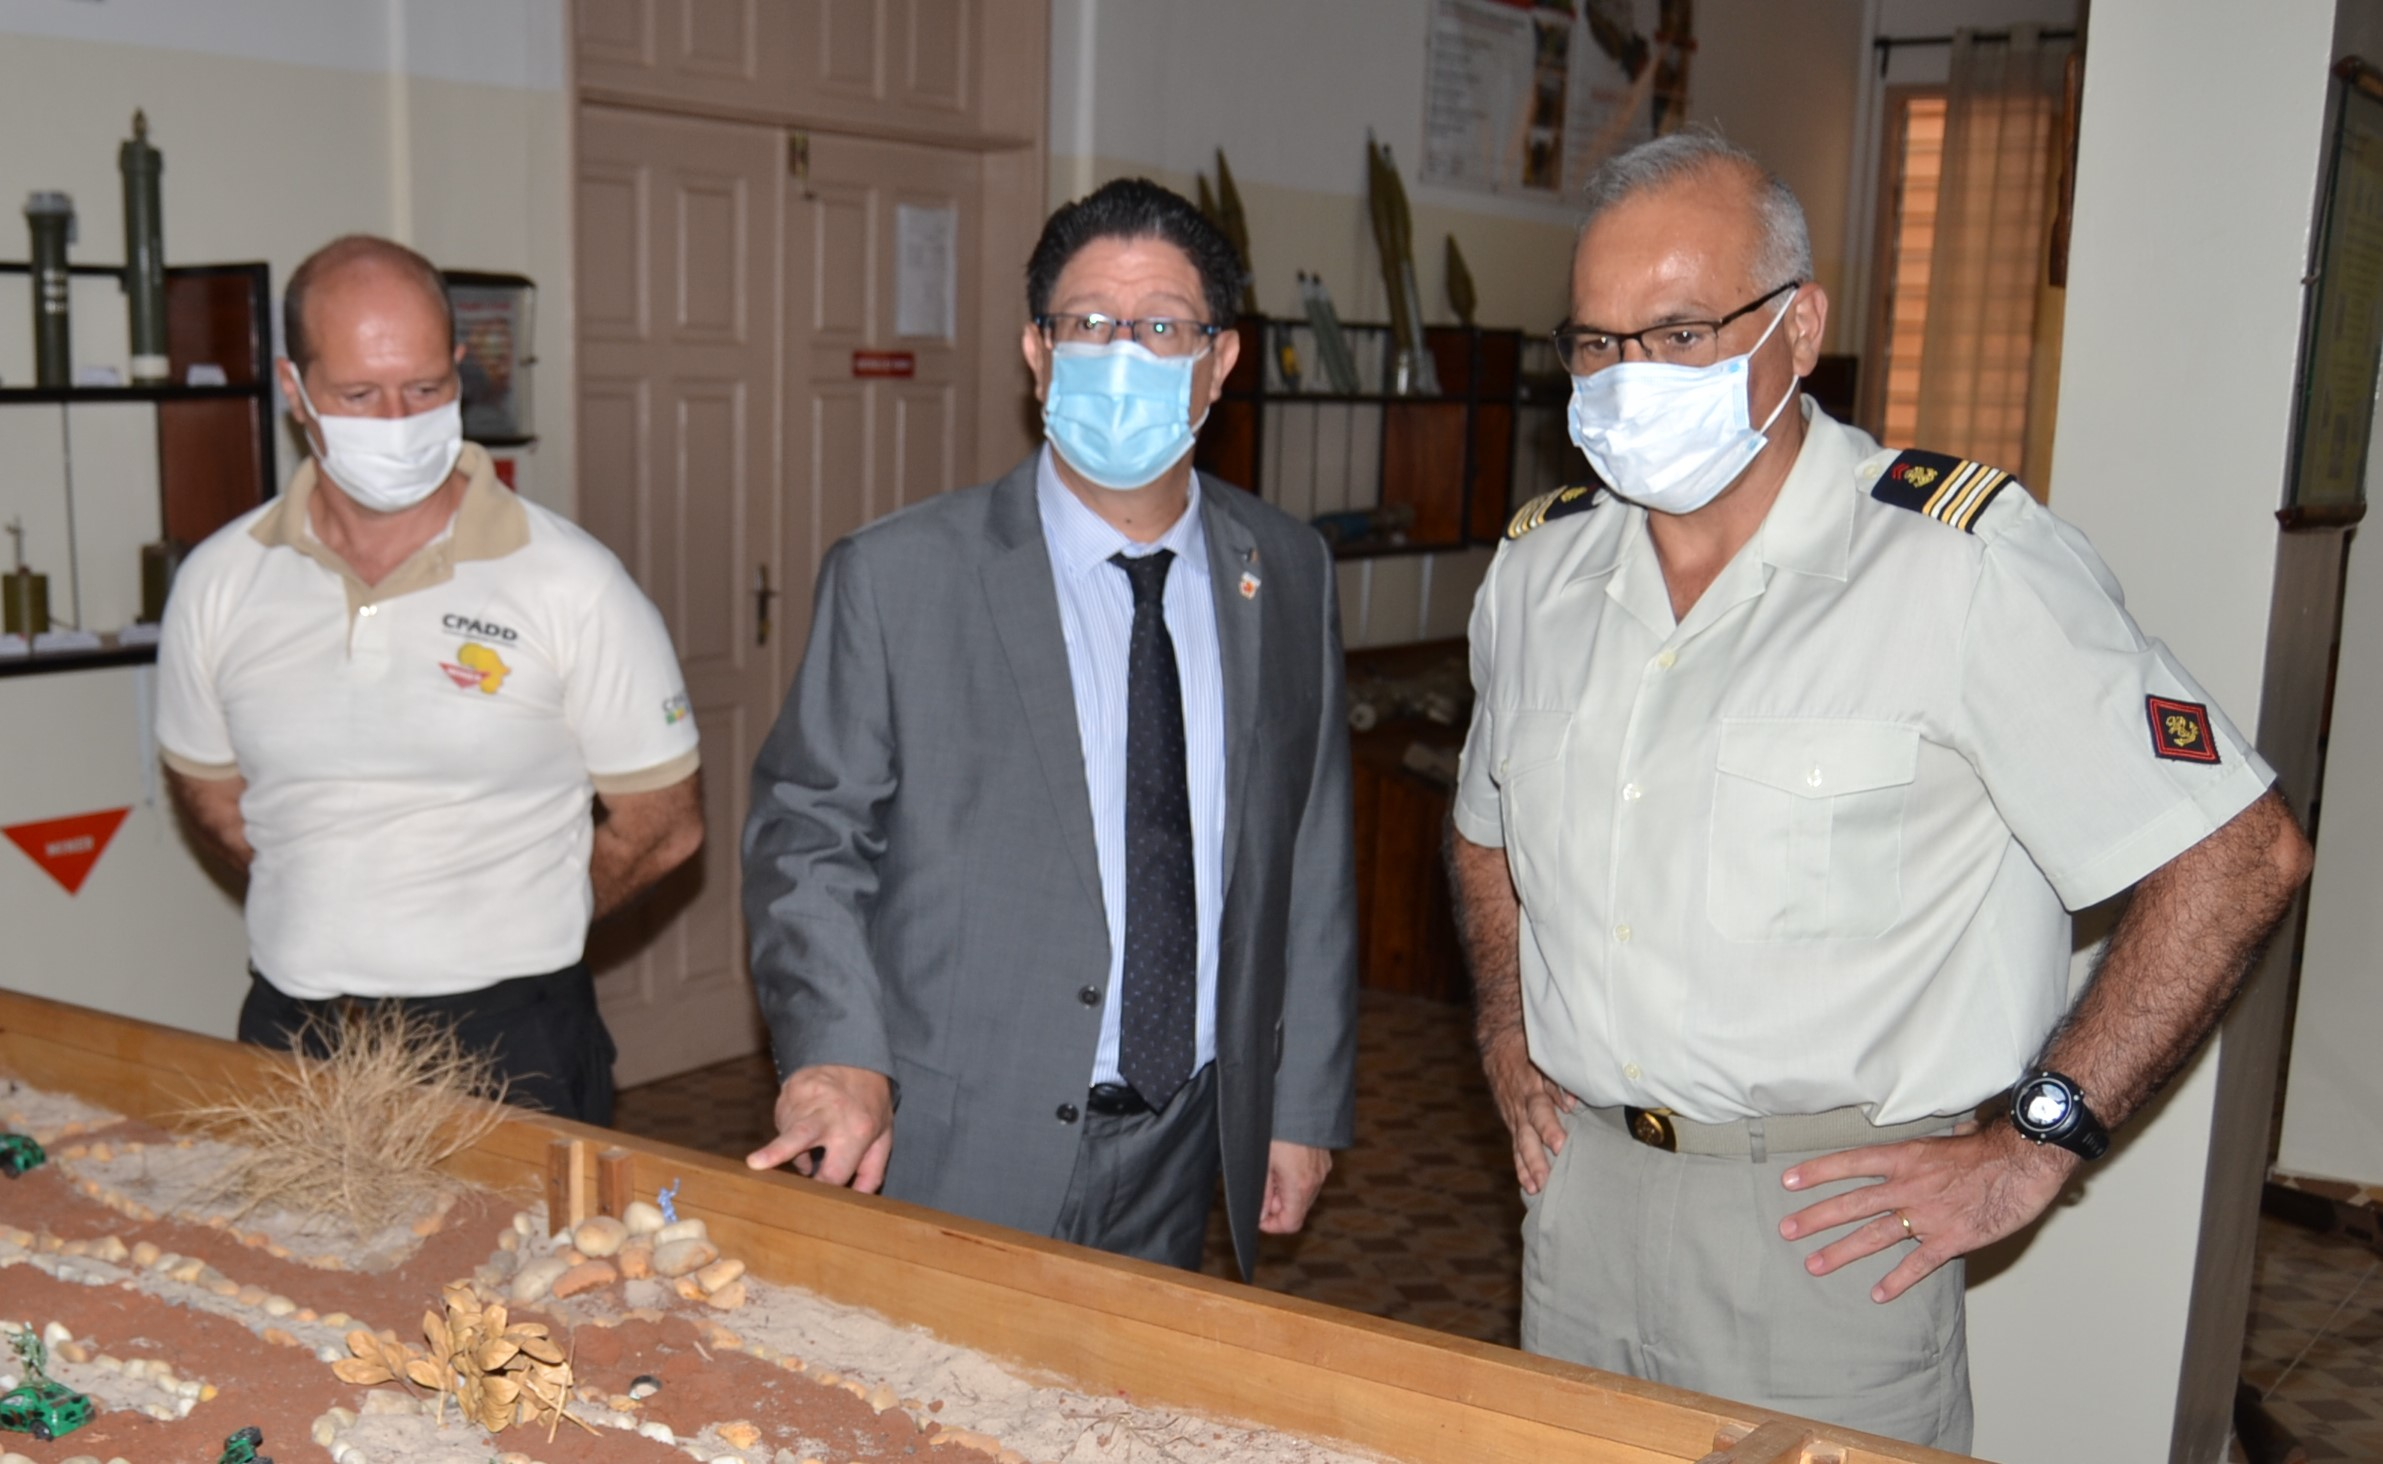 Visite de l'ambassadeur de France